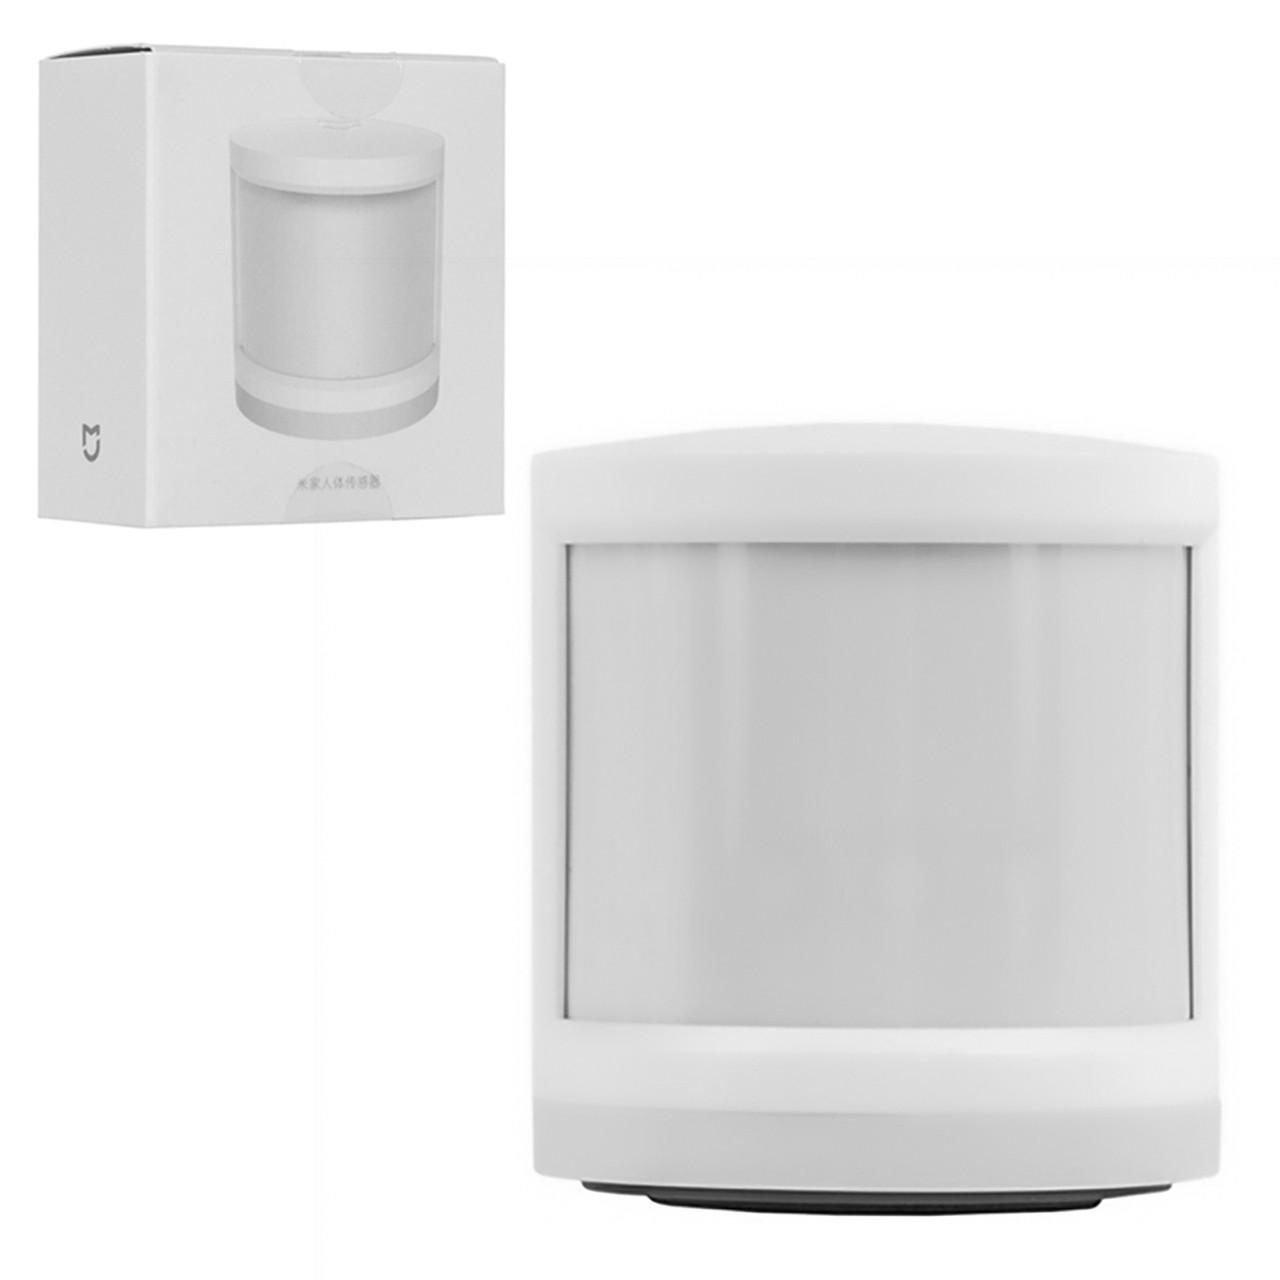 Датчик движения Xiaomi Mi Smart Home Occupancy Sensor, White